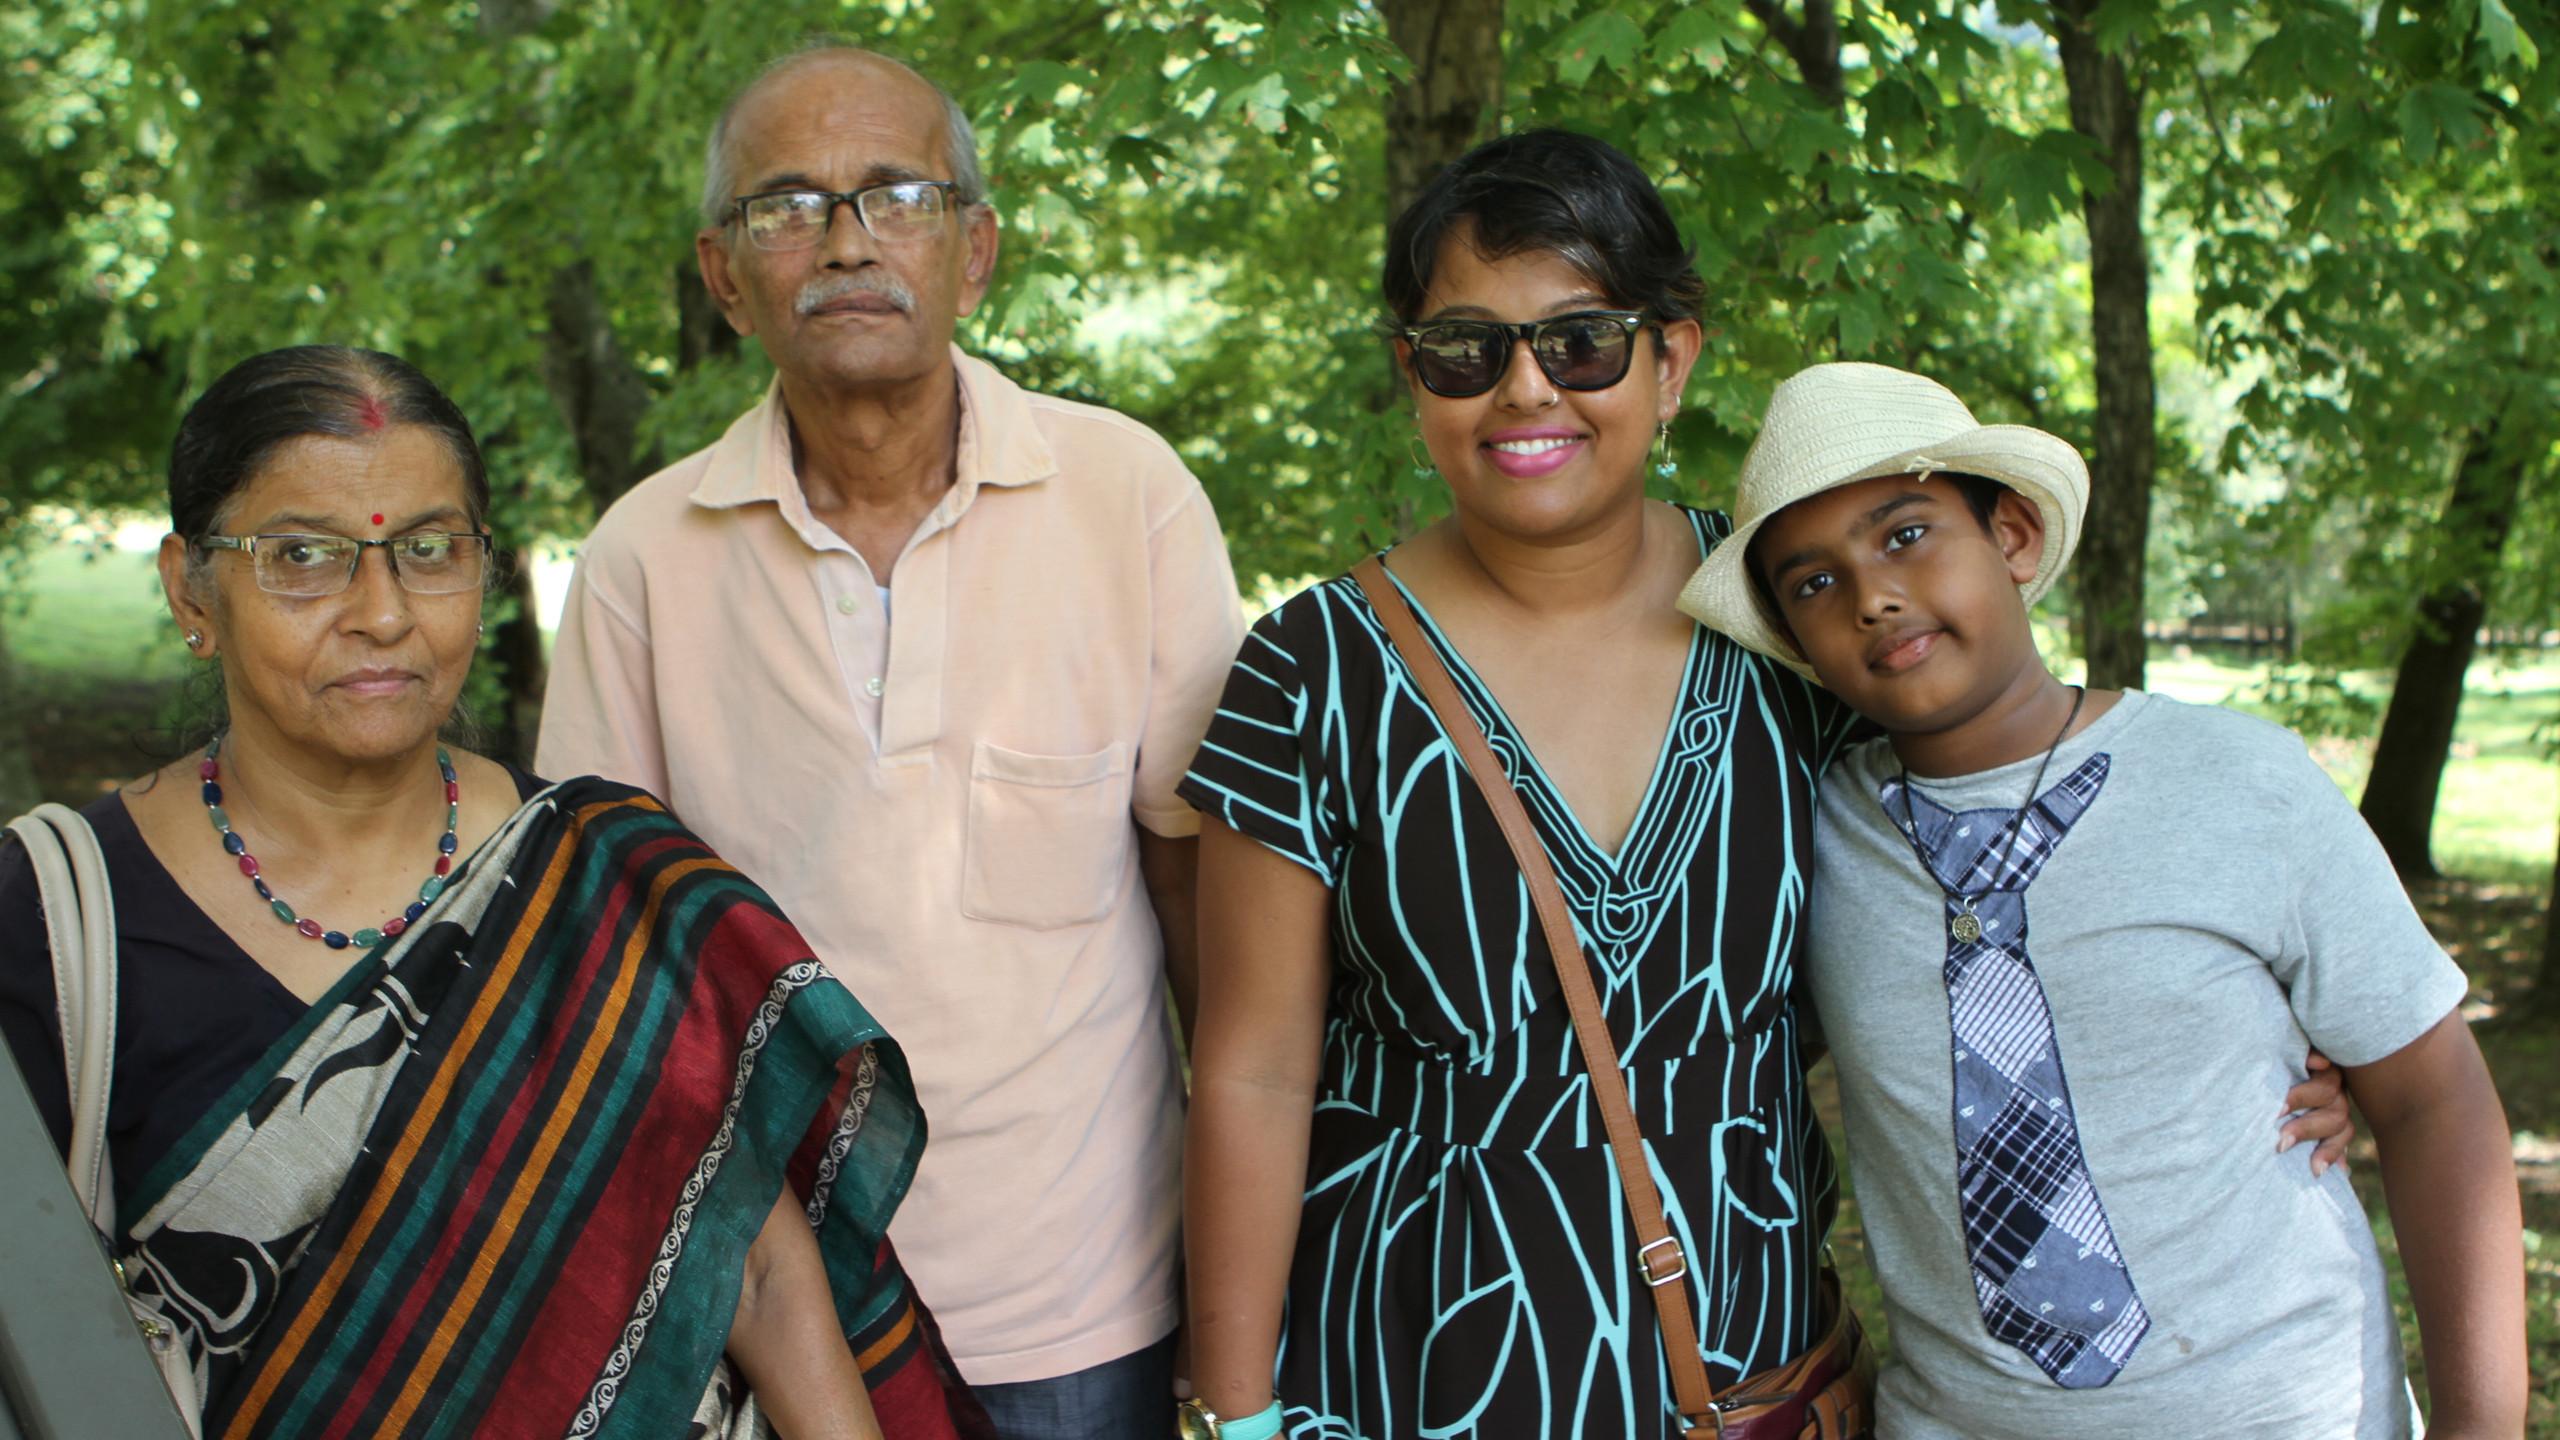 Sibani & Bimales Dhadtacharya, Kakali &